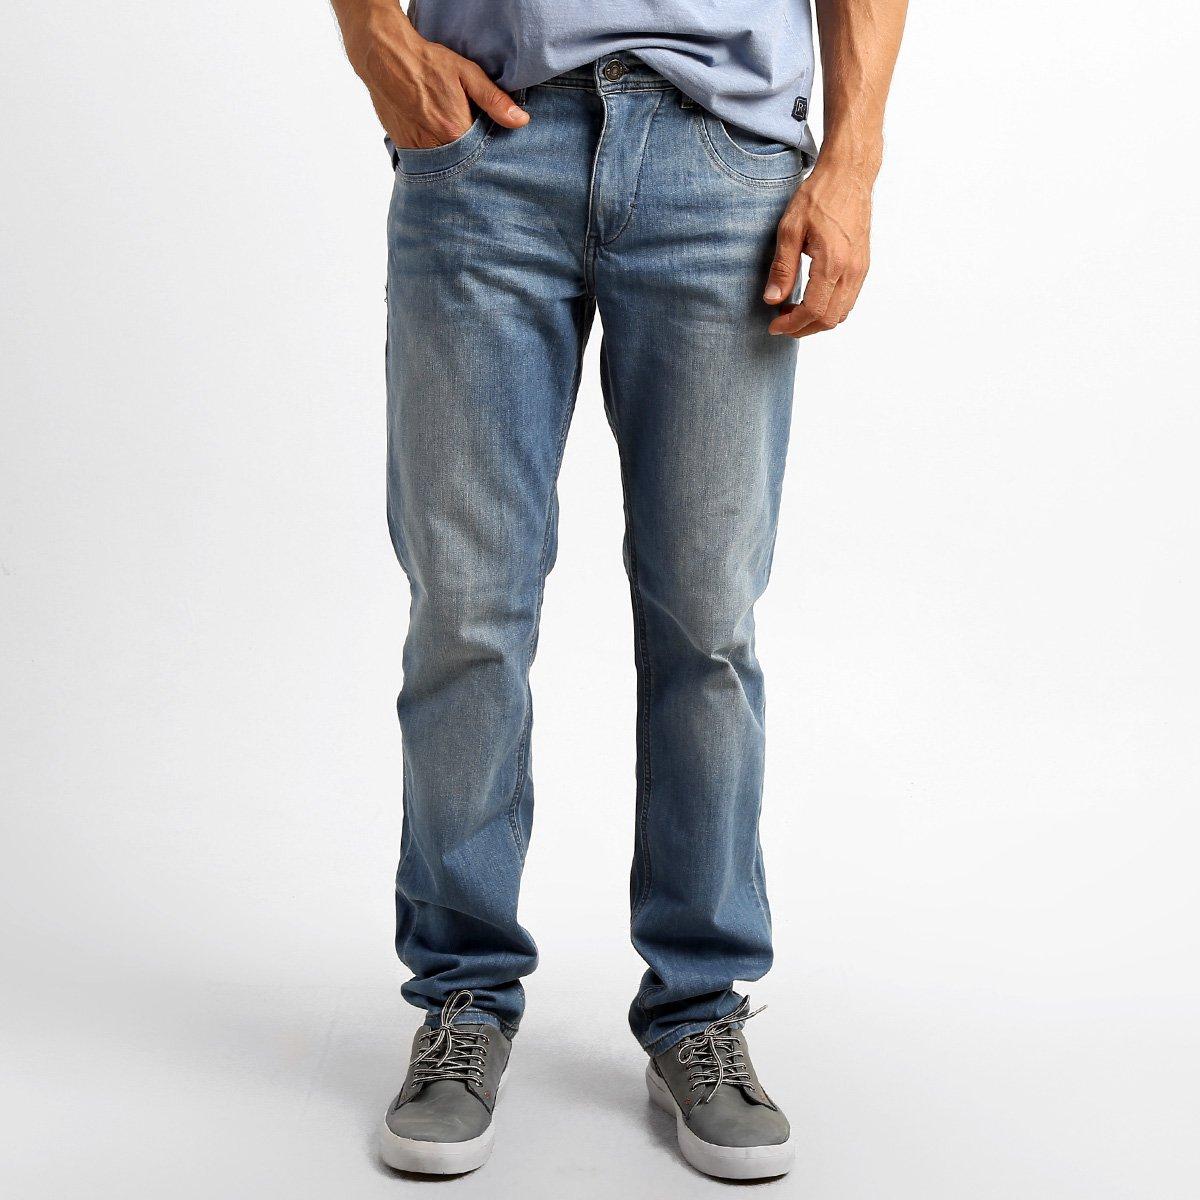 baebd7c7e Calça Jeans Richards Classic - Compre Agora | Zattini